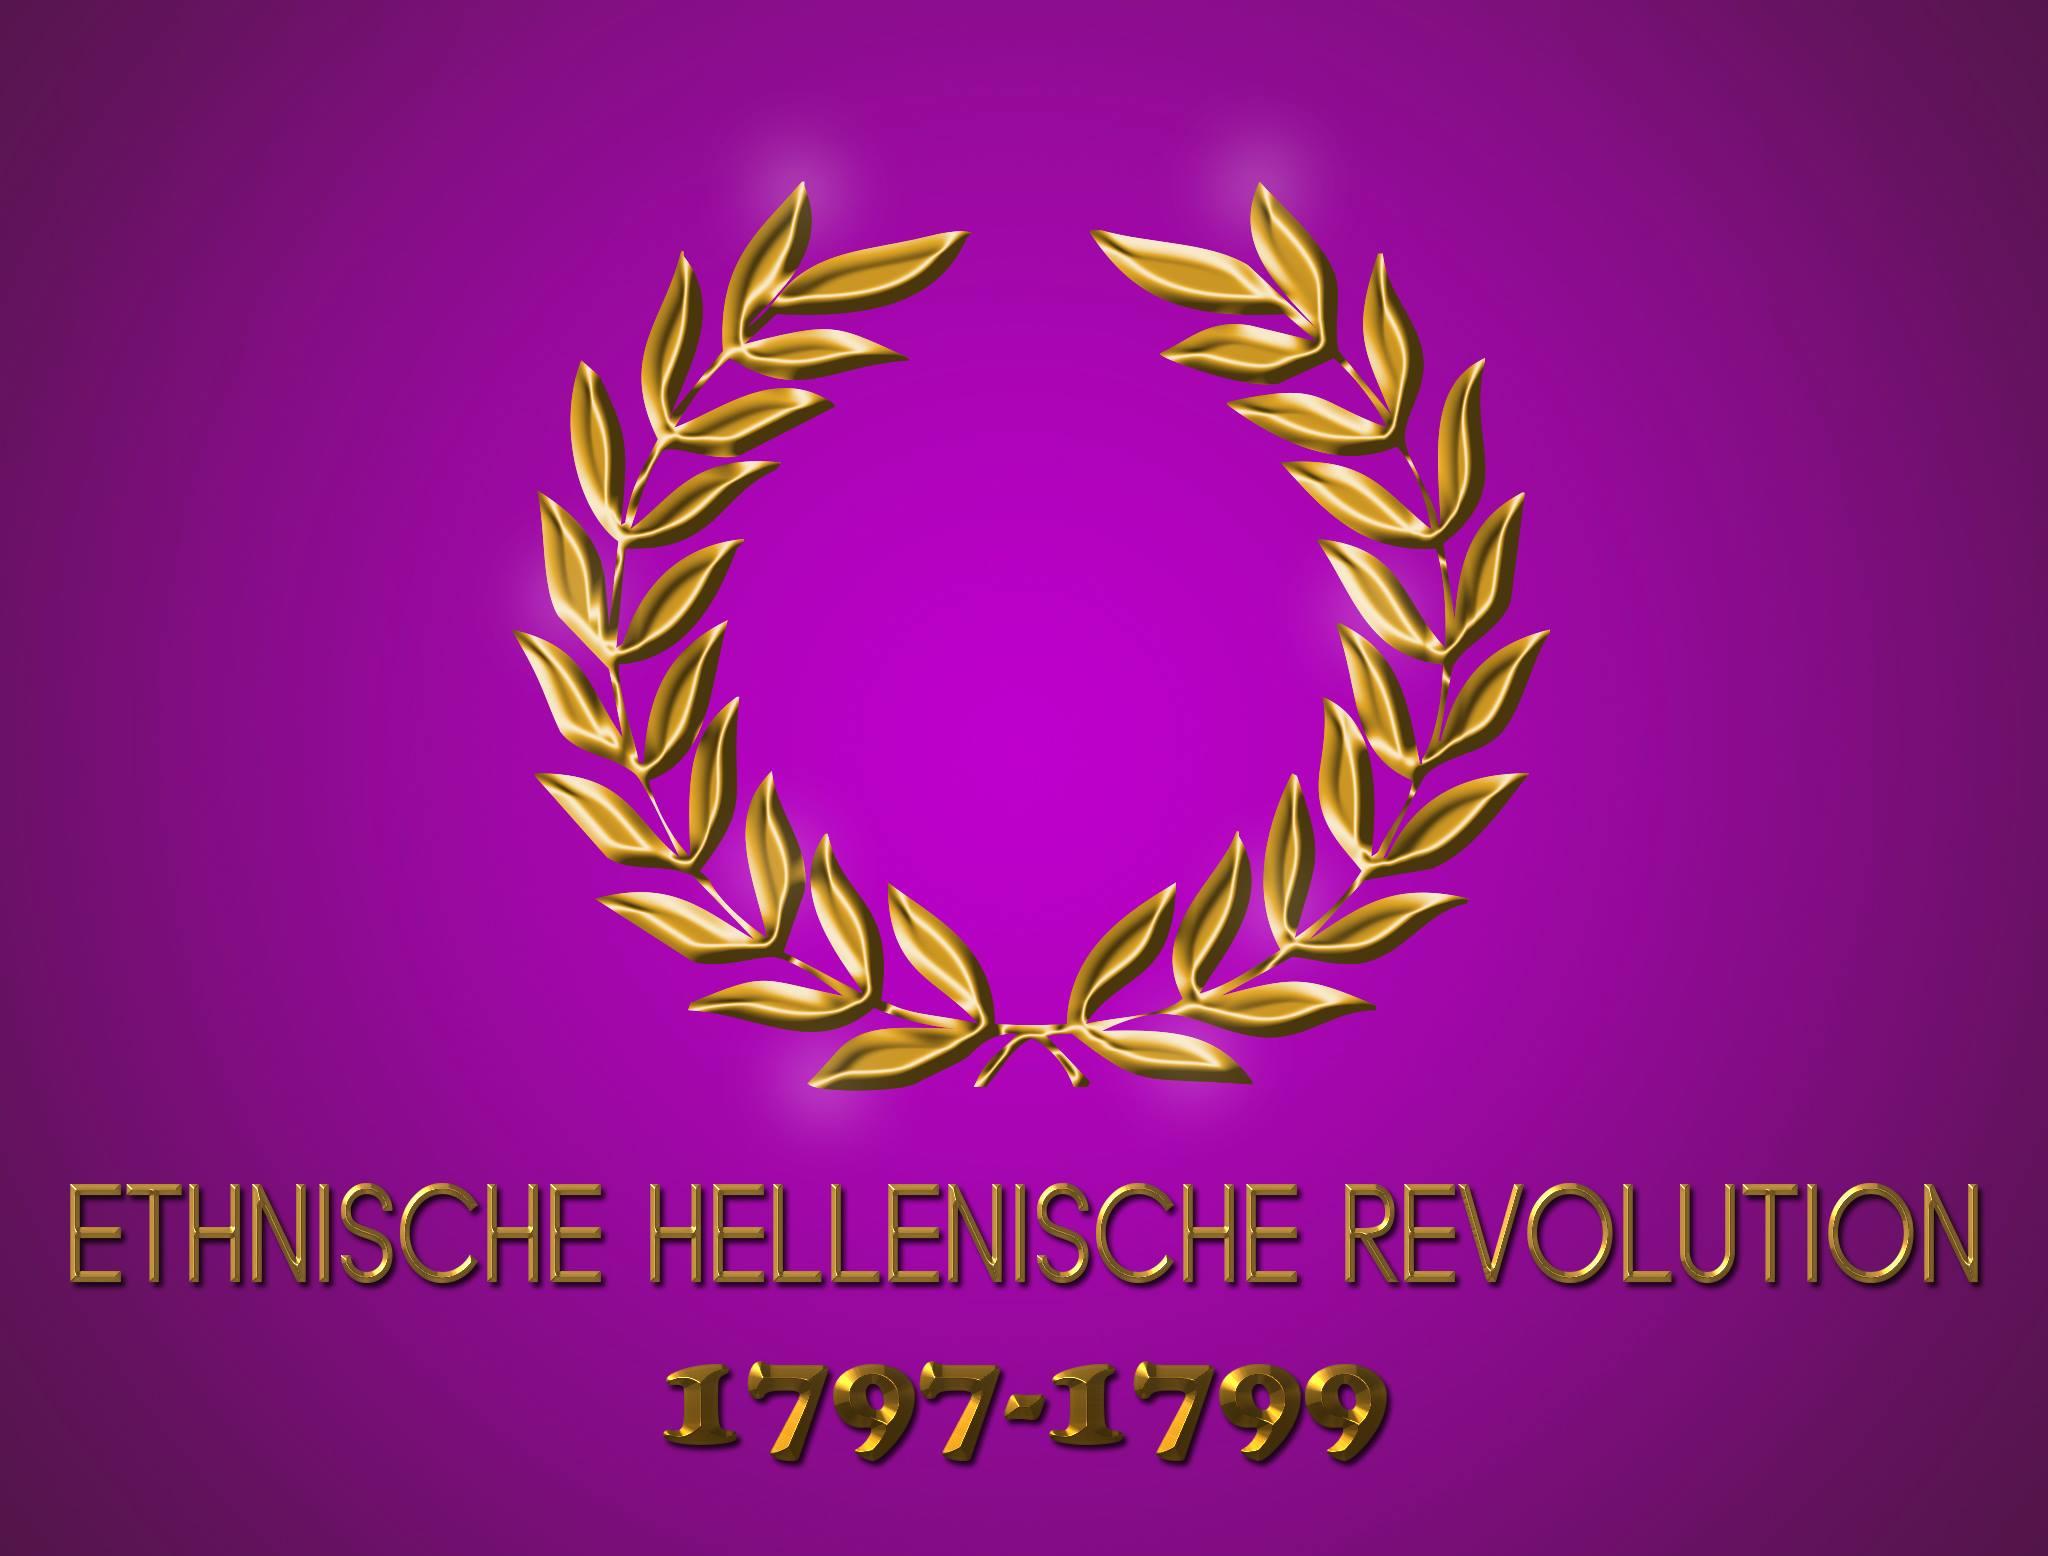 Ethnische Hellenische Revolution